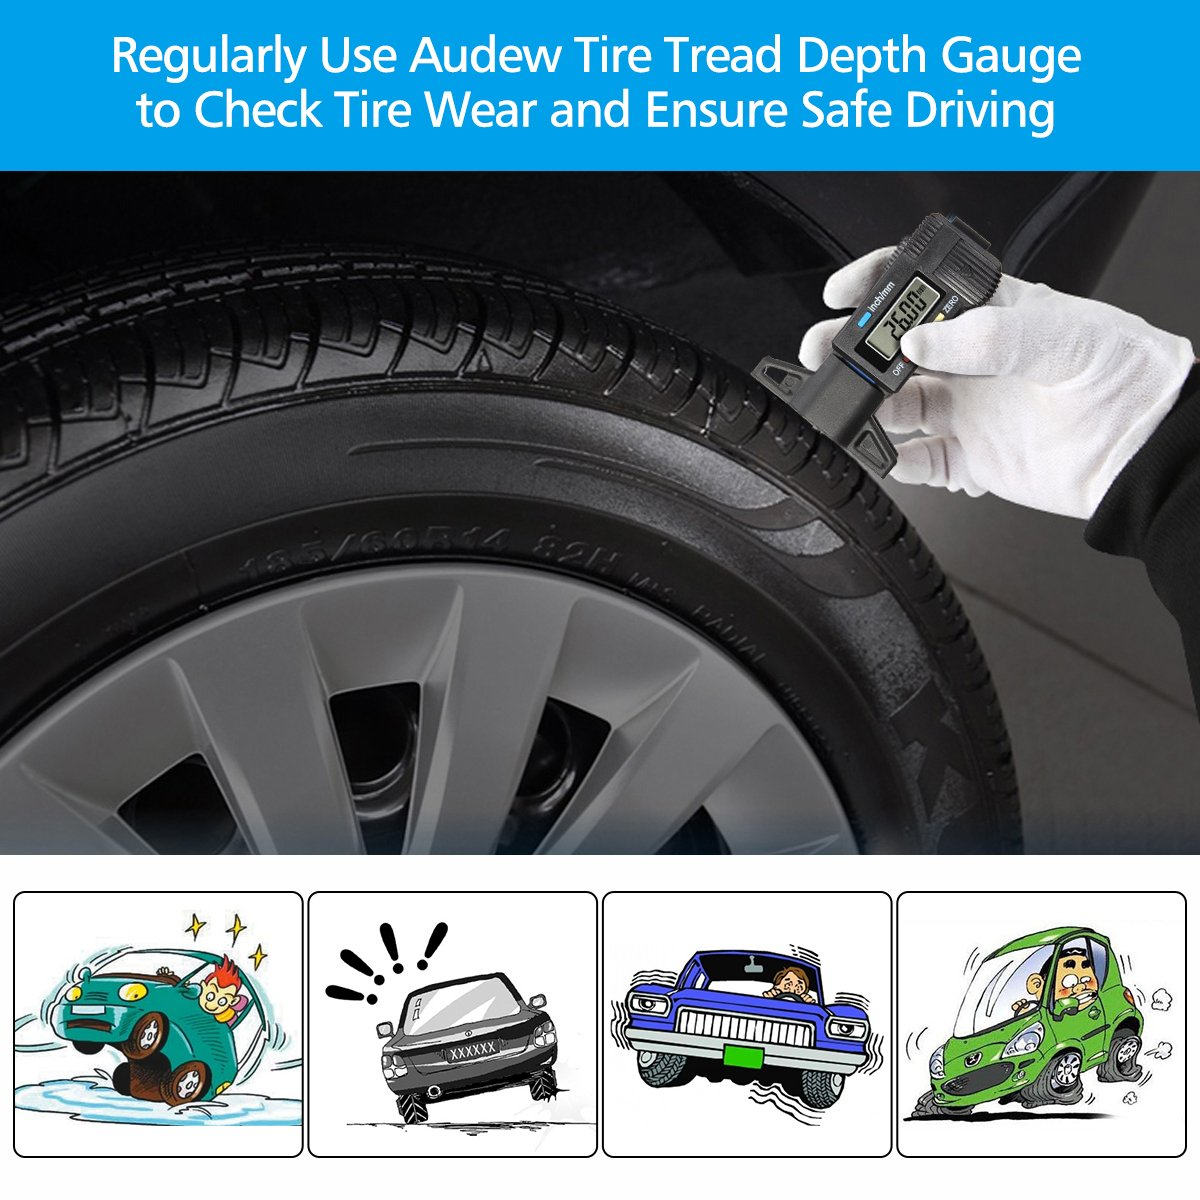 Audew Digital Tire Tread Depth Gauge - Digital Tire Gauge Meter Measurer LCD Display Tread Checker Tire Tester for Cars Trucks Vans SUV, Metric Inch Conversion 0-25.4mm by Audew (Image #4)